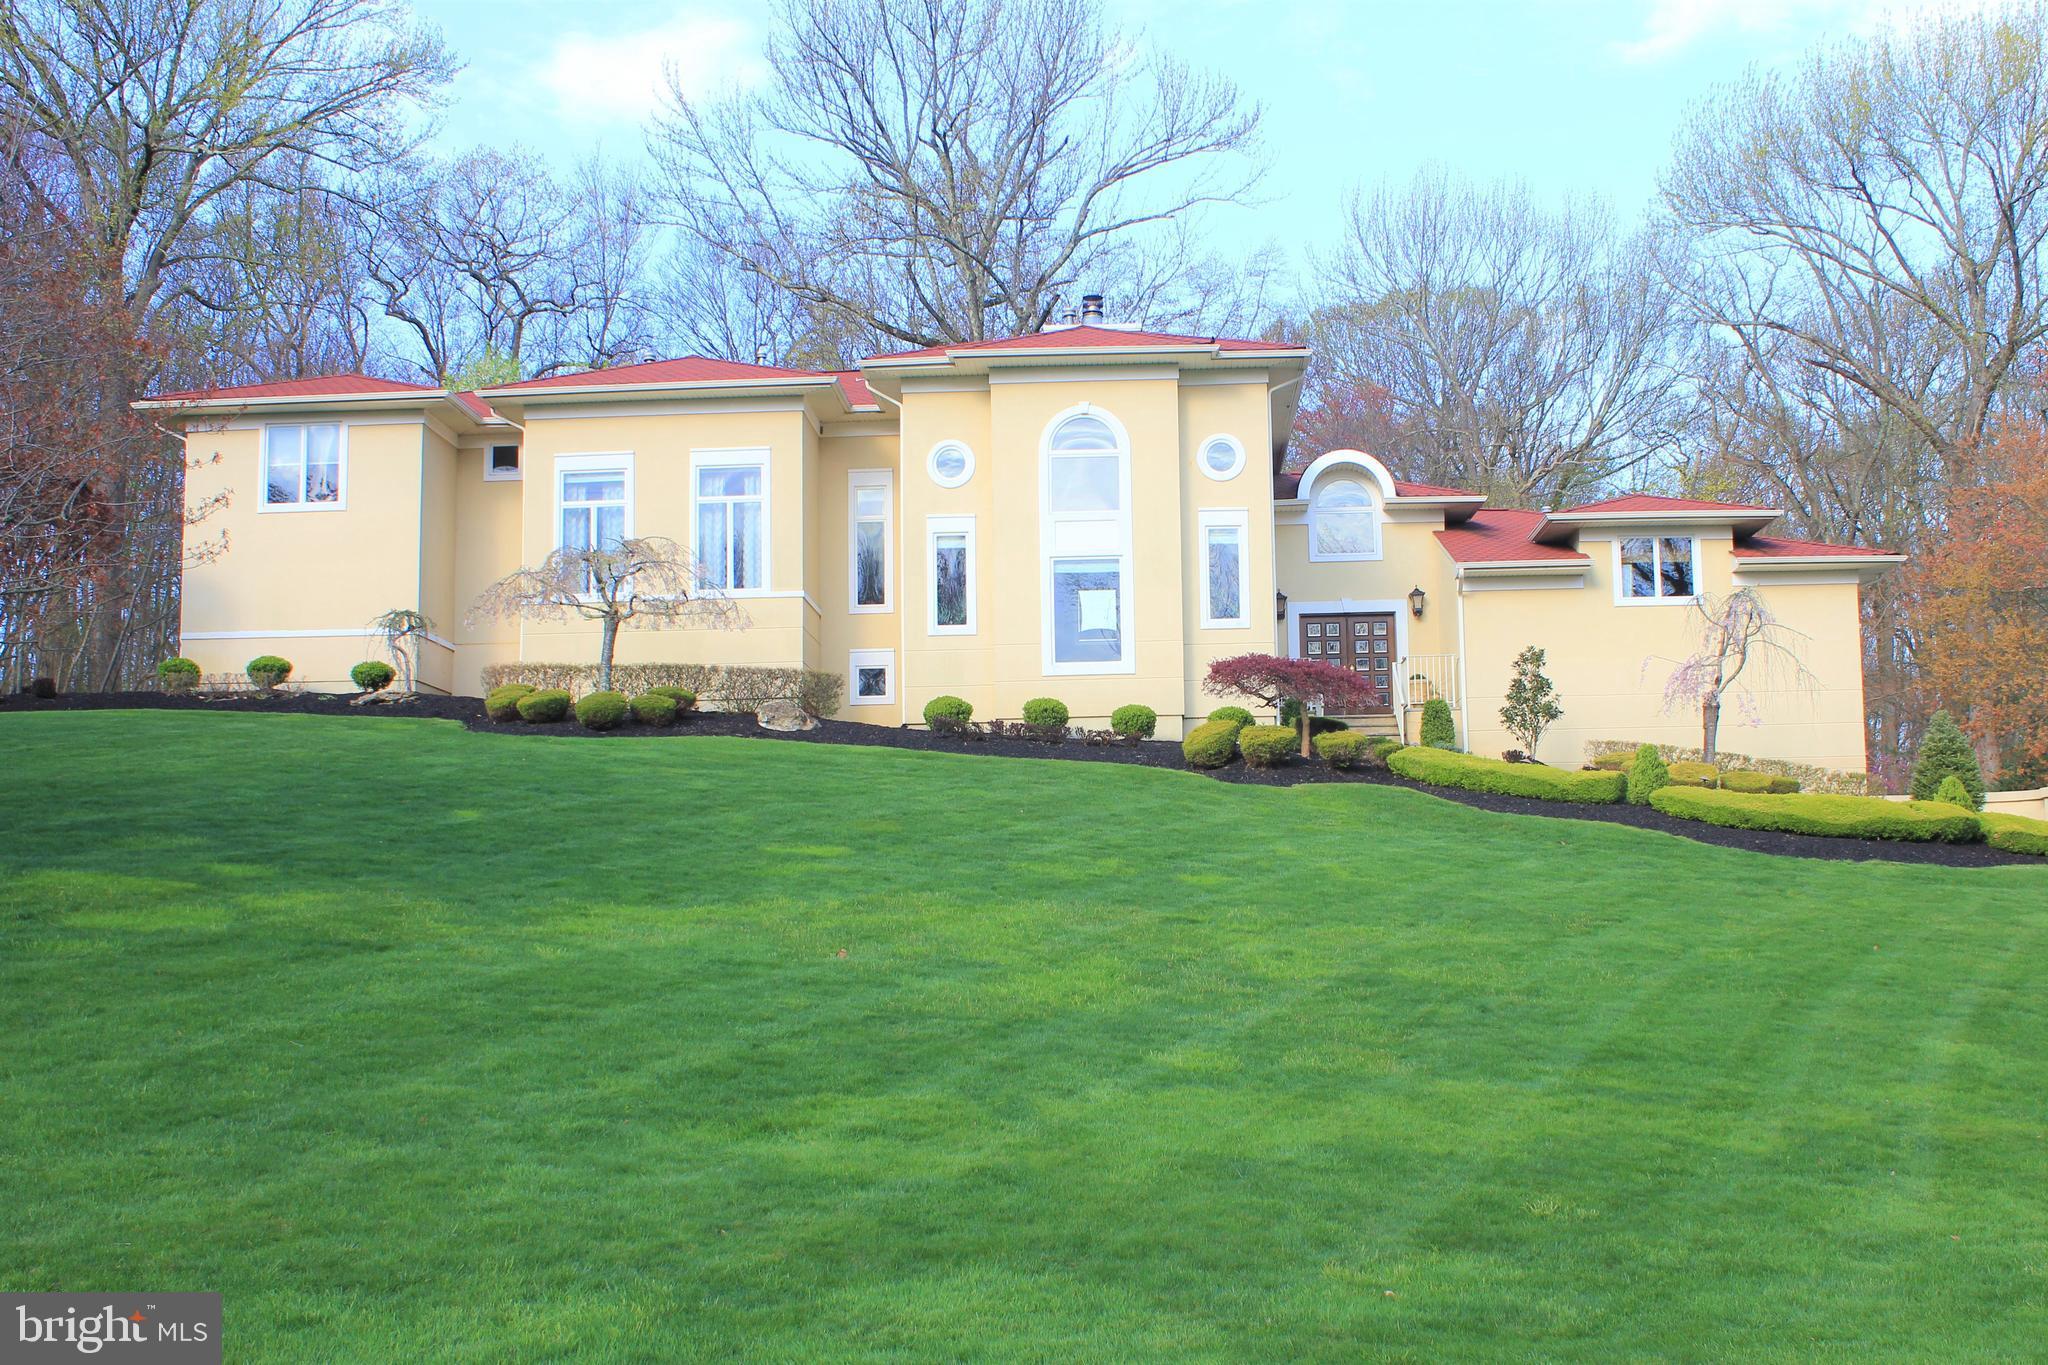 1 Shady Oak Court, Millstone Township, NJ 08535